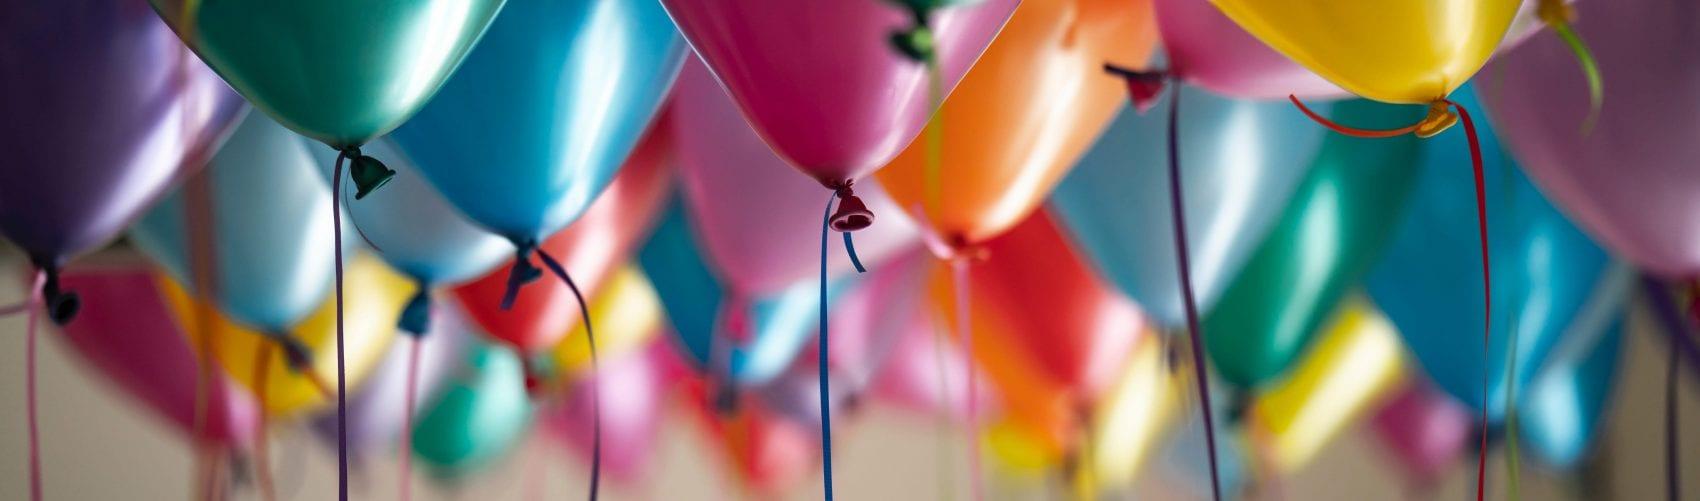 happy 15th anniversary marketri llc